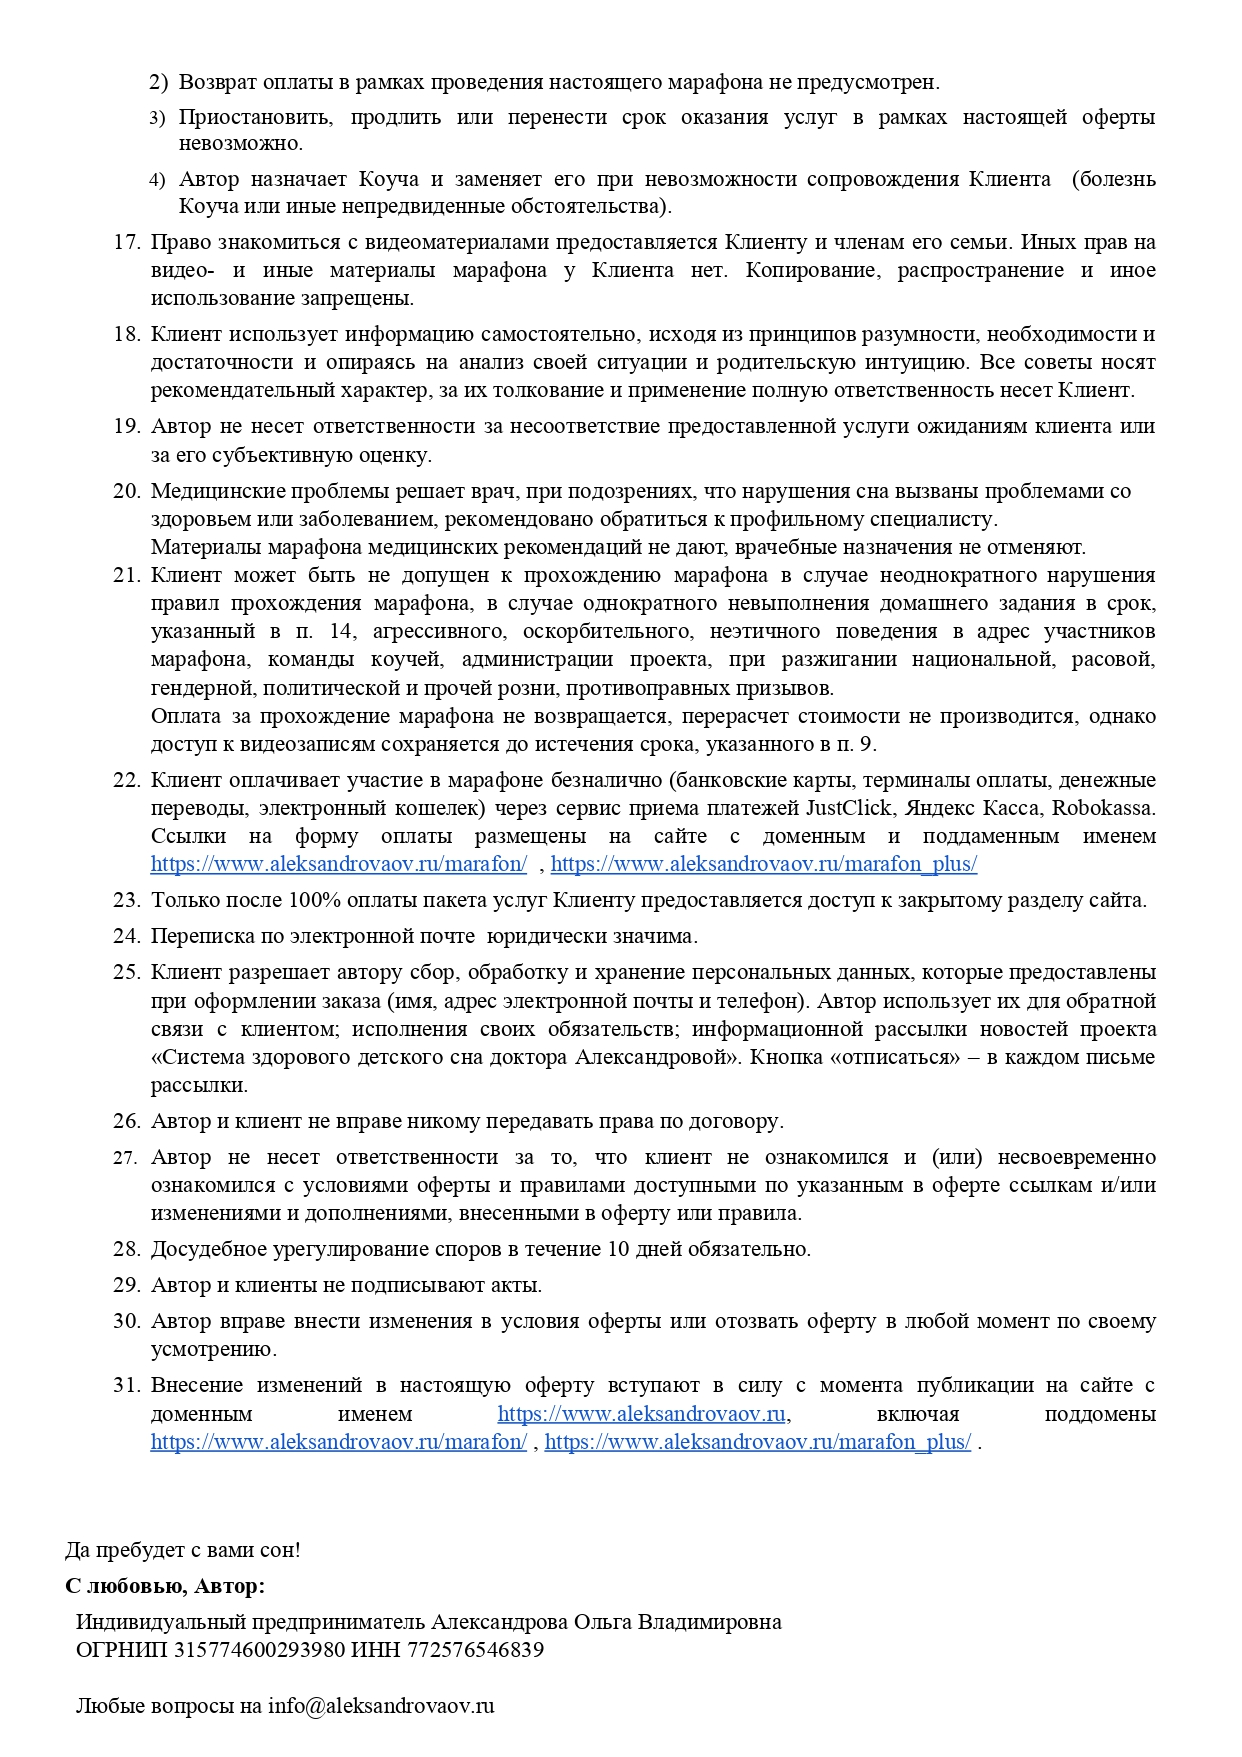 https://www.aleksandrovaov.ru/wp-content/uploads/2019/10/oferta-3.jpg